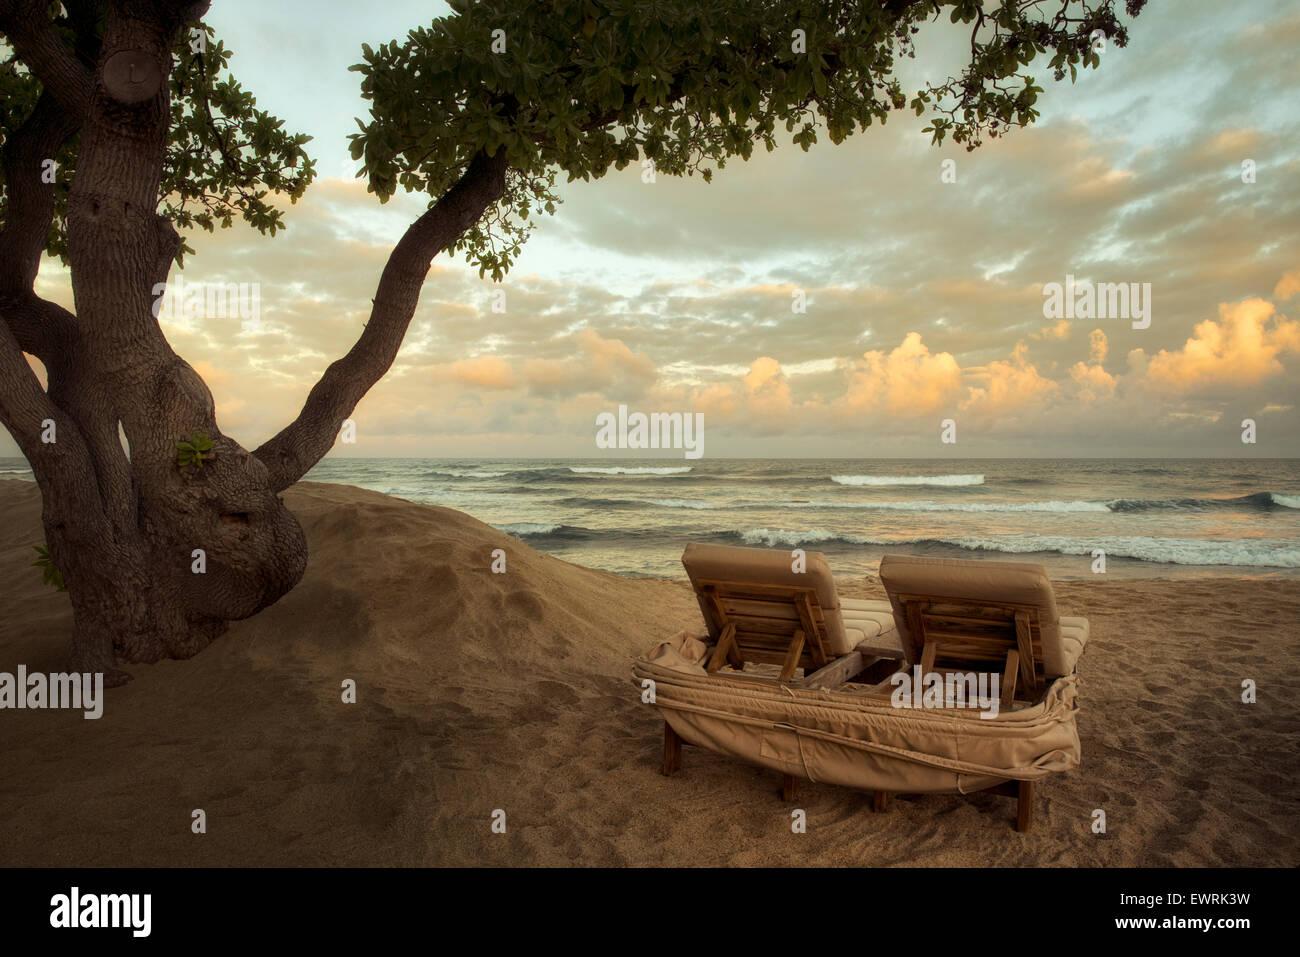 Sunrise and waves with beach chairs. Hawaii, The big Island. Stock Photo